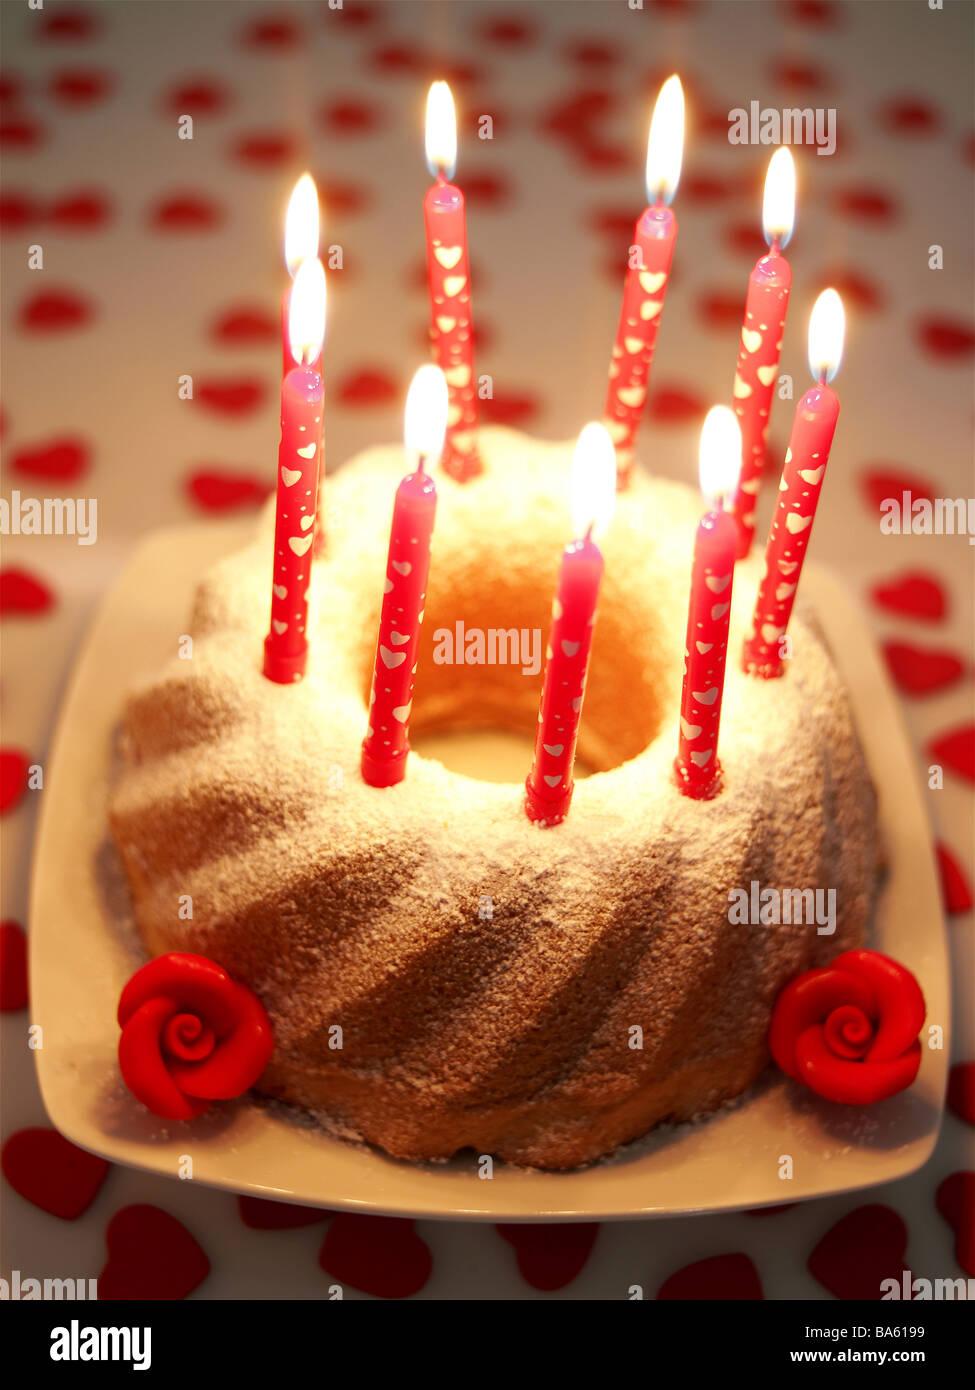 Birthday Cakes Candles Series Burn Food Stock Photos Birthday